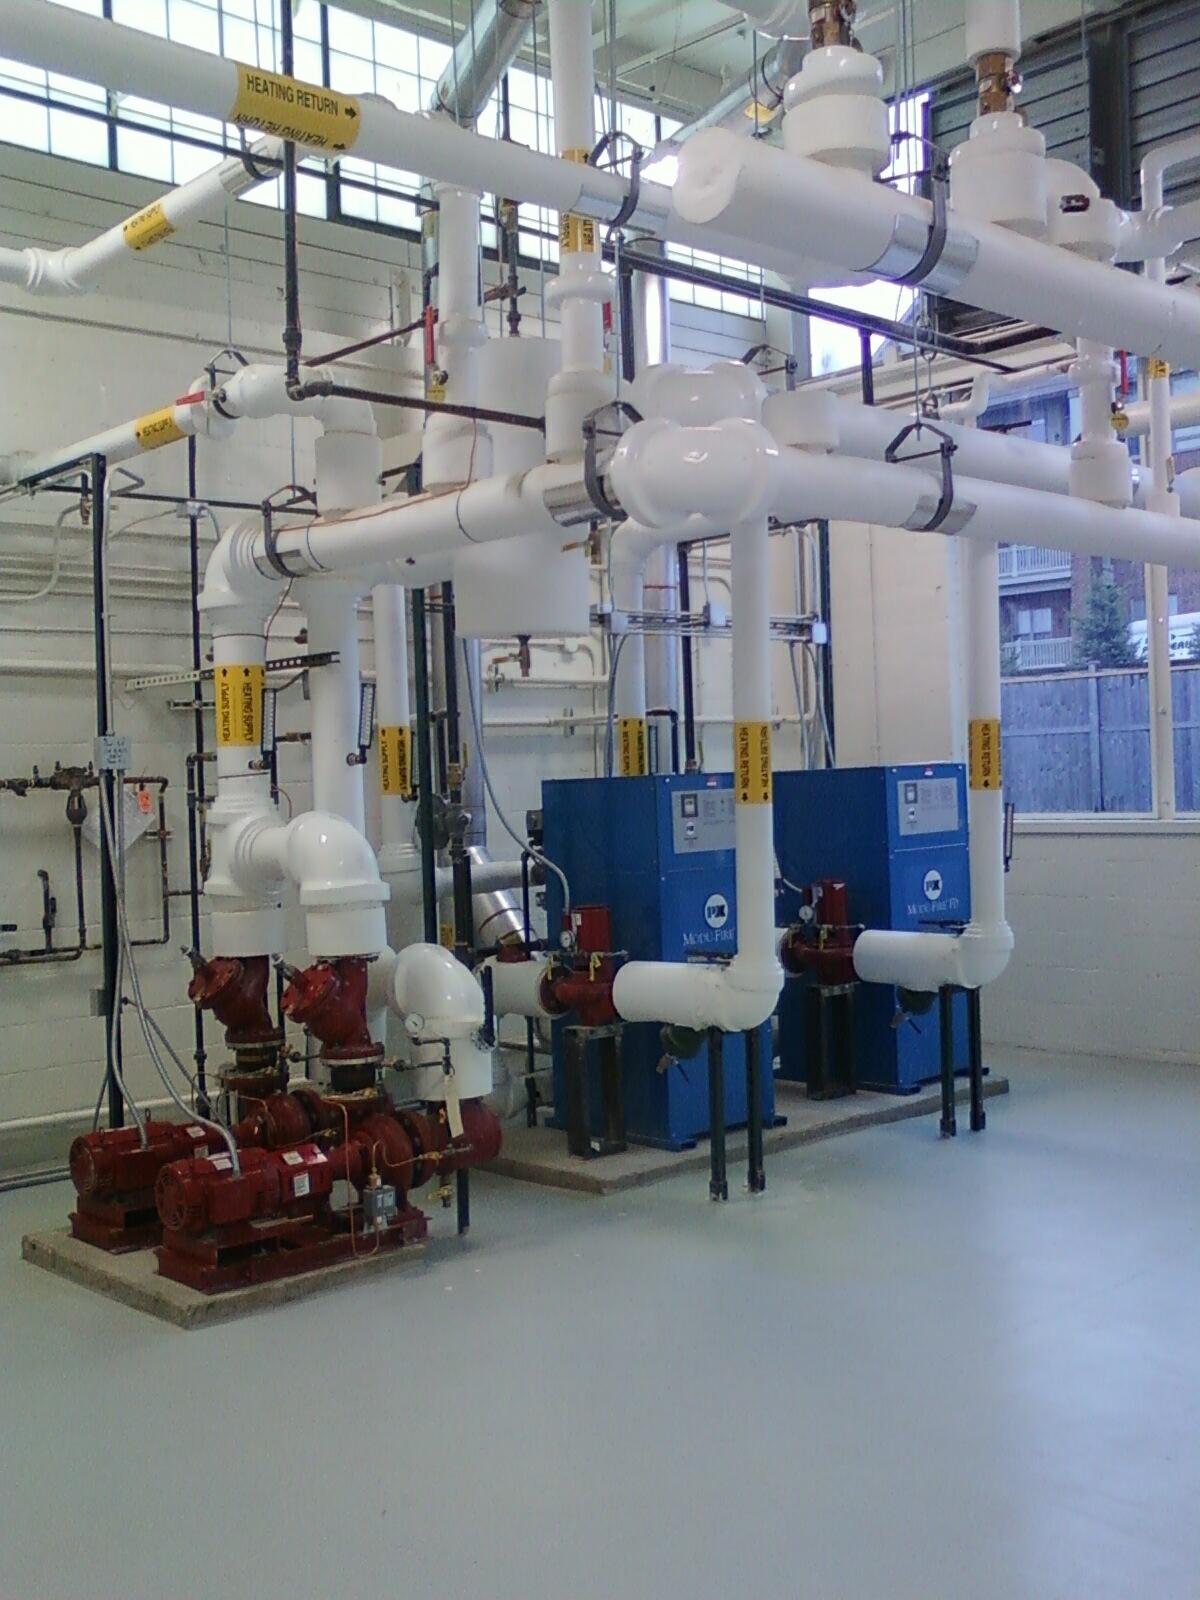 F E Moran Inc Mechanical Systems Orland Park Illinois Proview